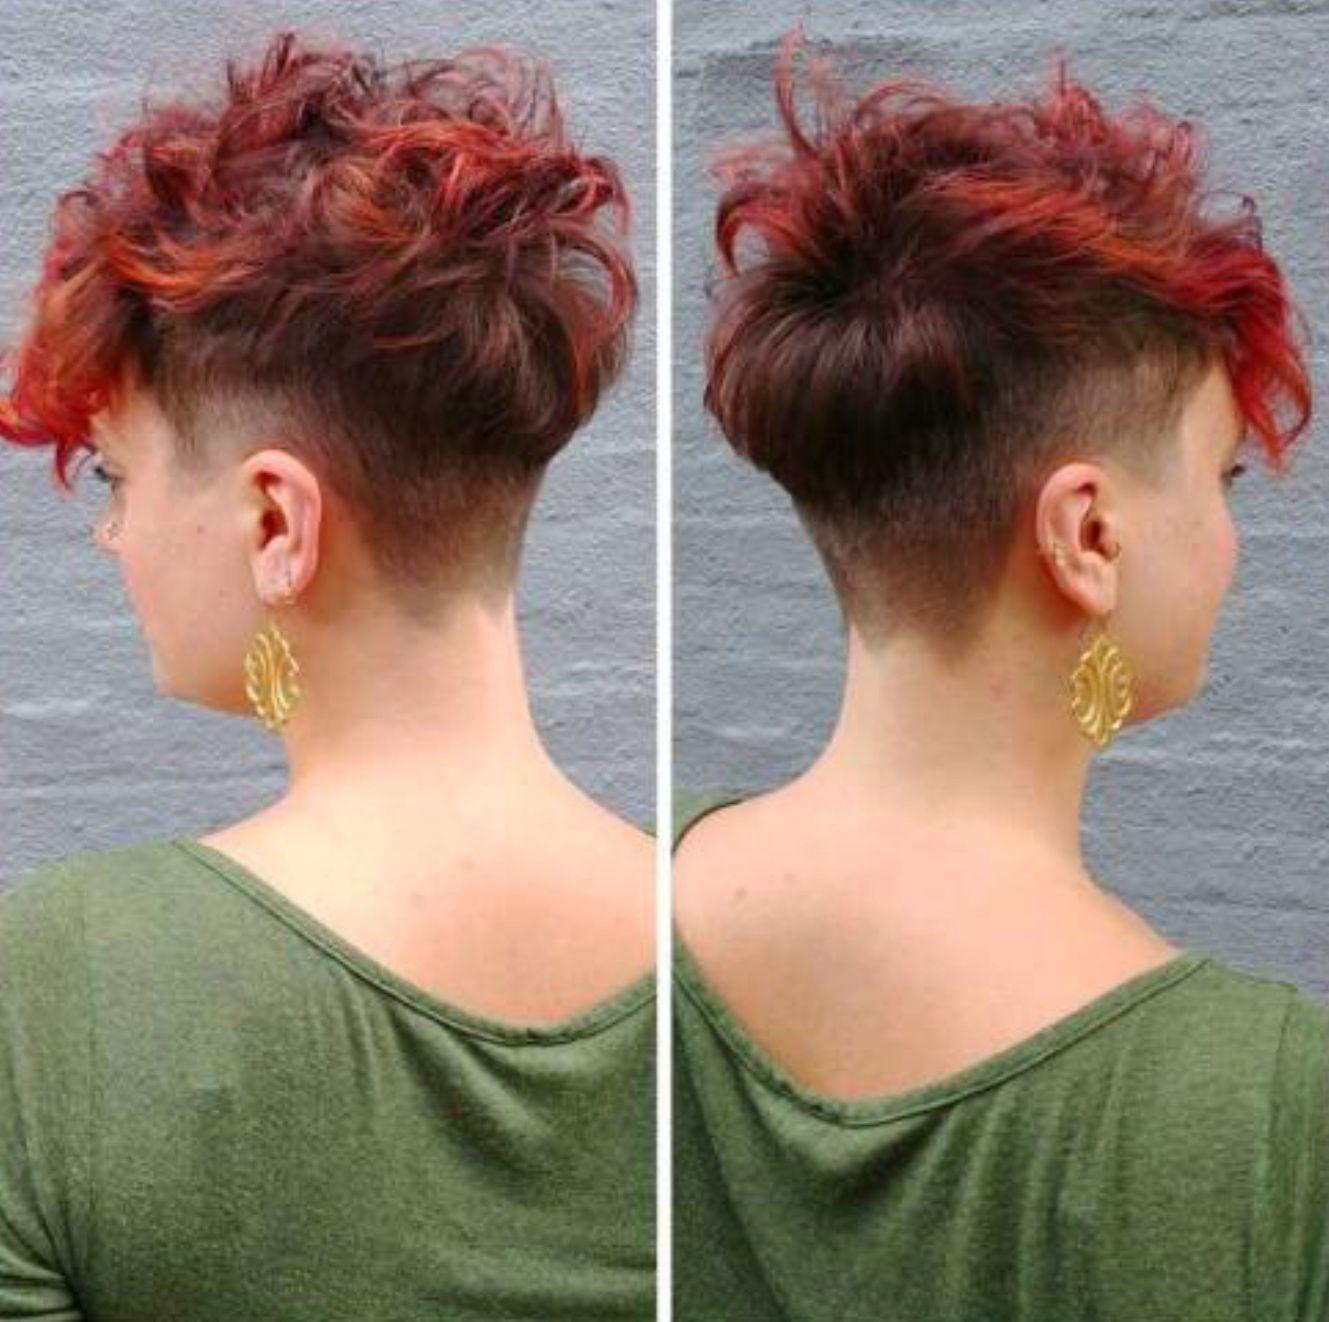 Hairdare style women styleinspiration hair dare sexy short